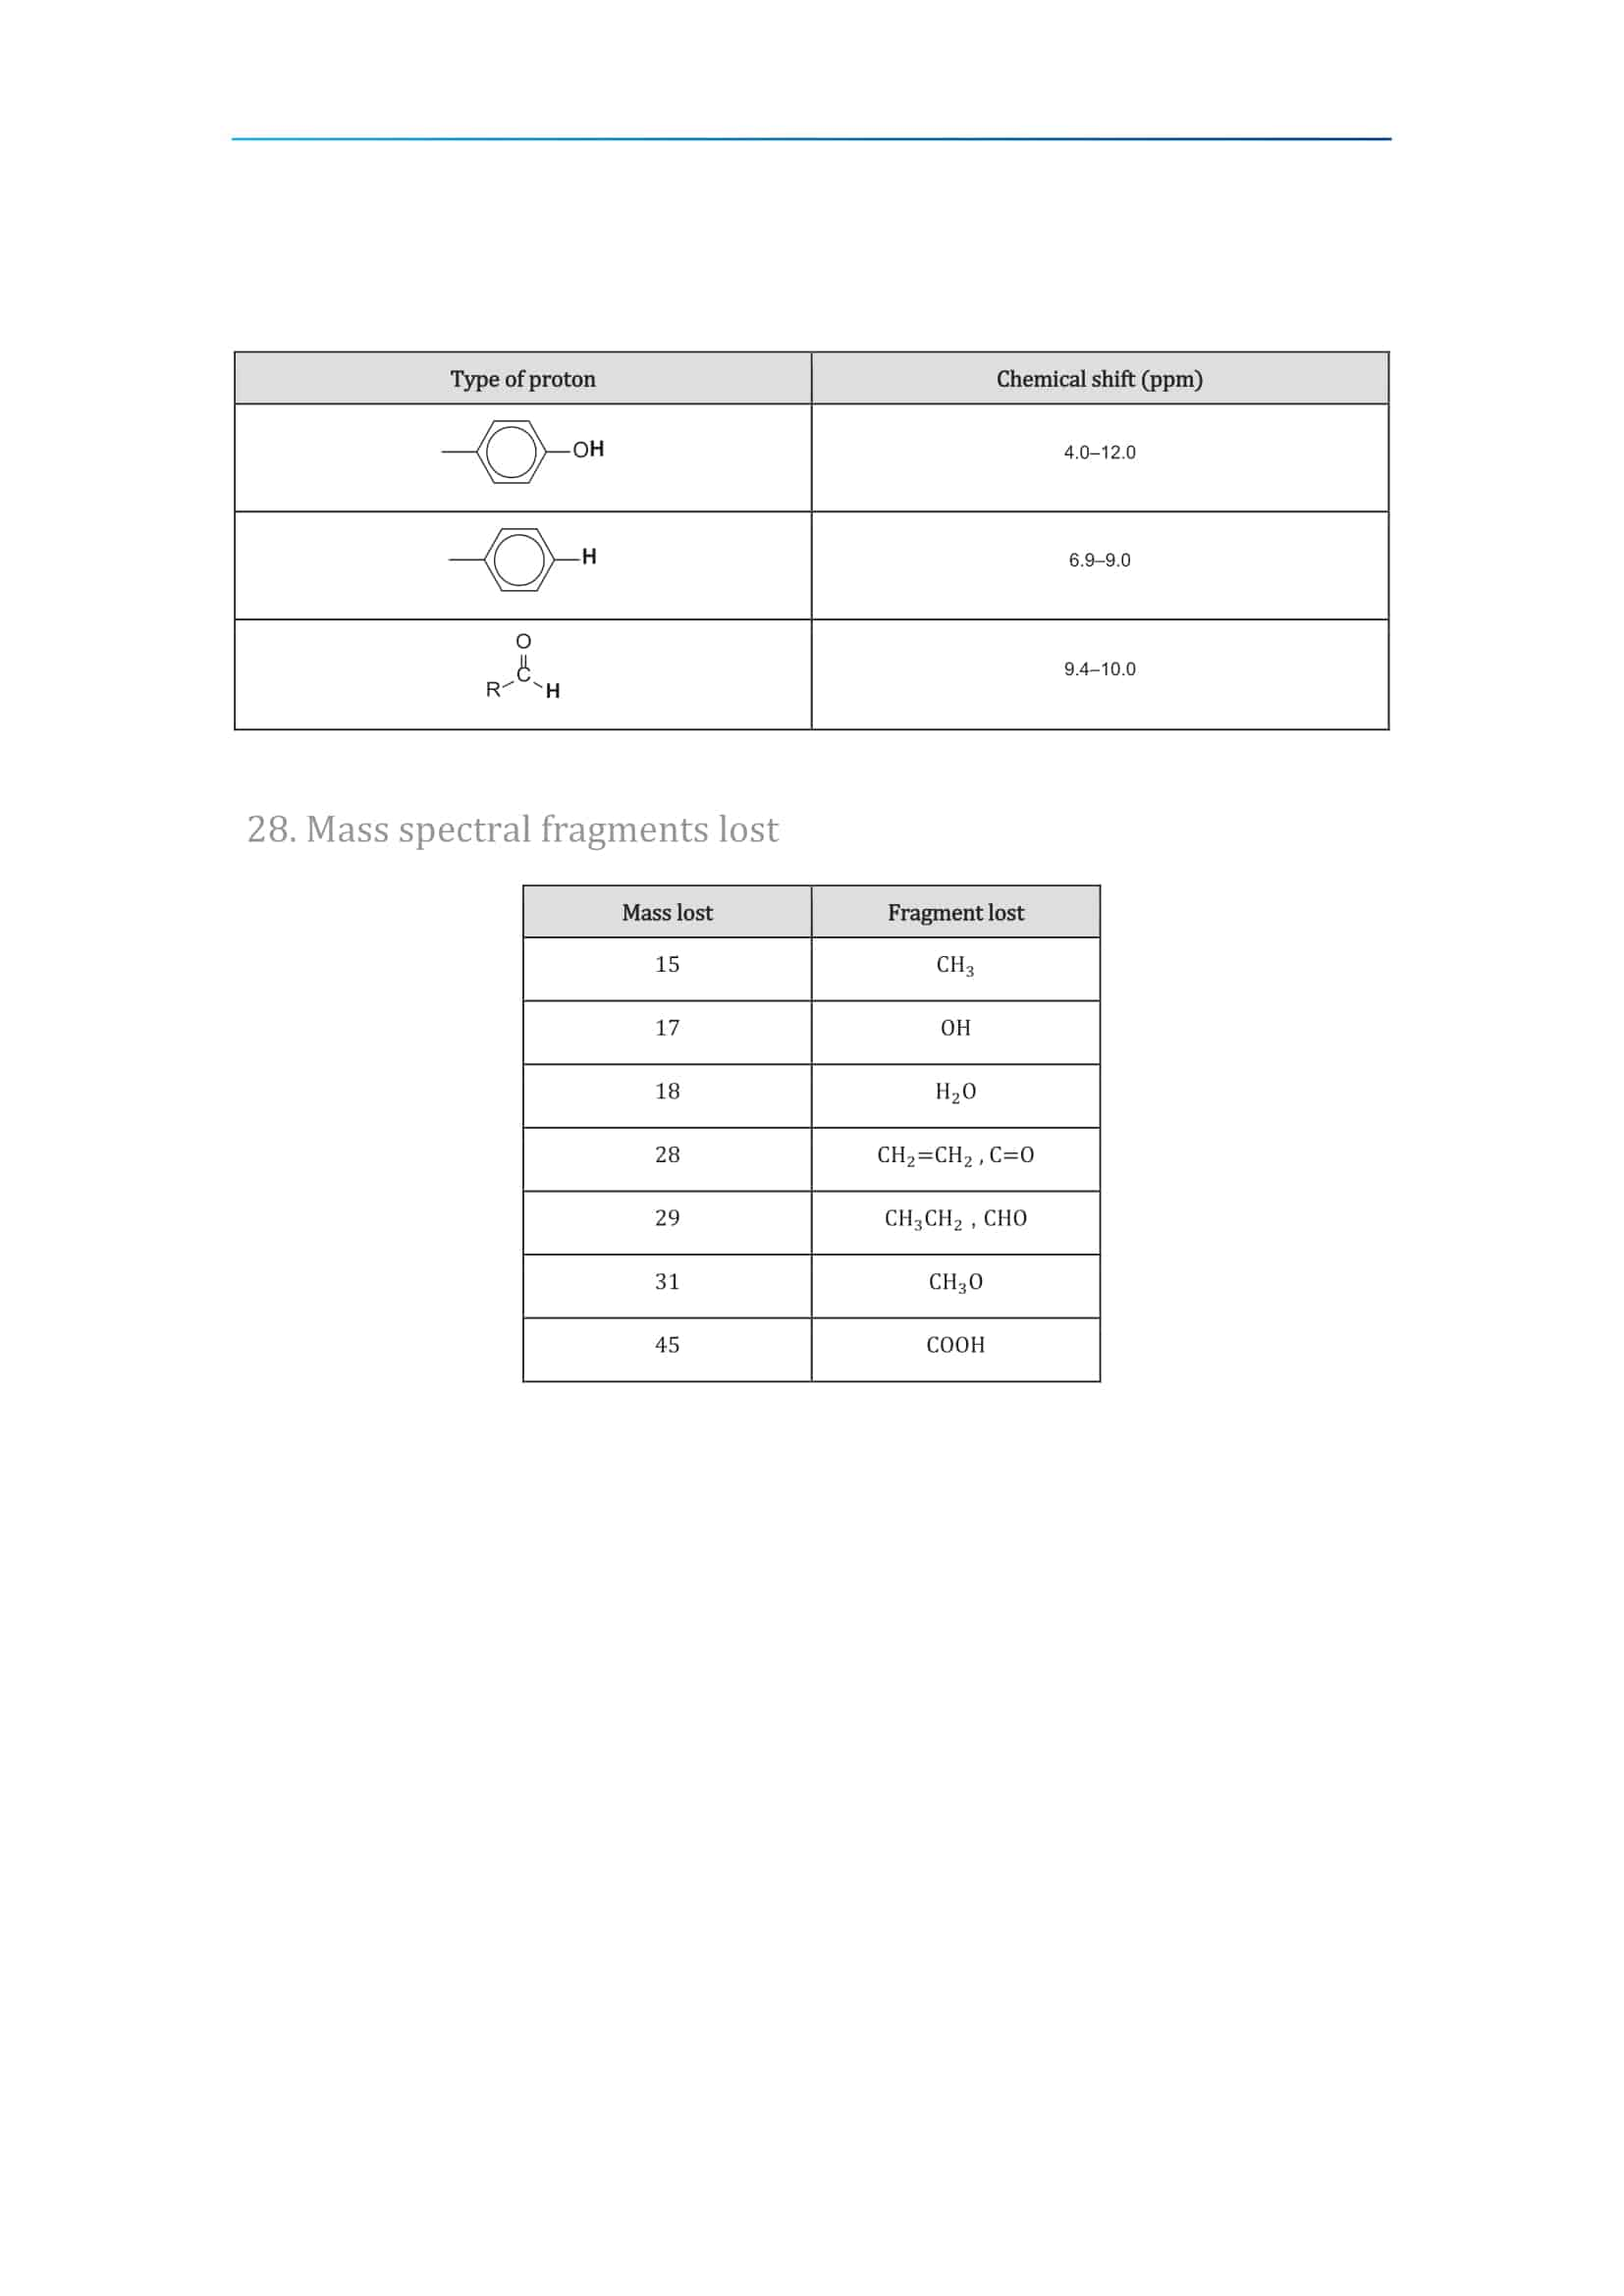 IB Chemistry Data Booklet 2020 31